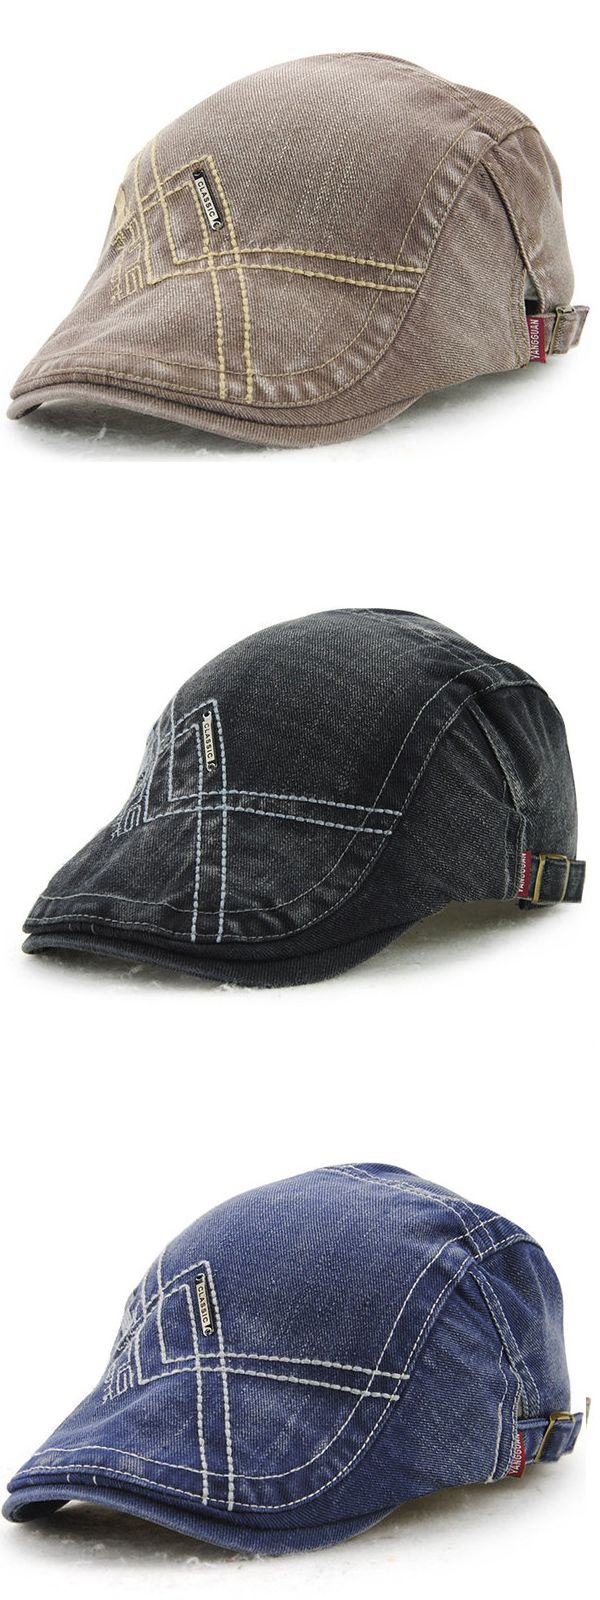 $10.11 Six Colors Men Denim Washing Beret Cap Casual Outdoor Sun Visor Hat